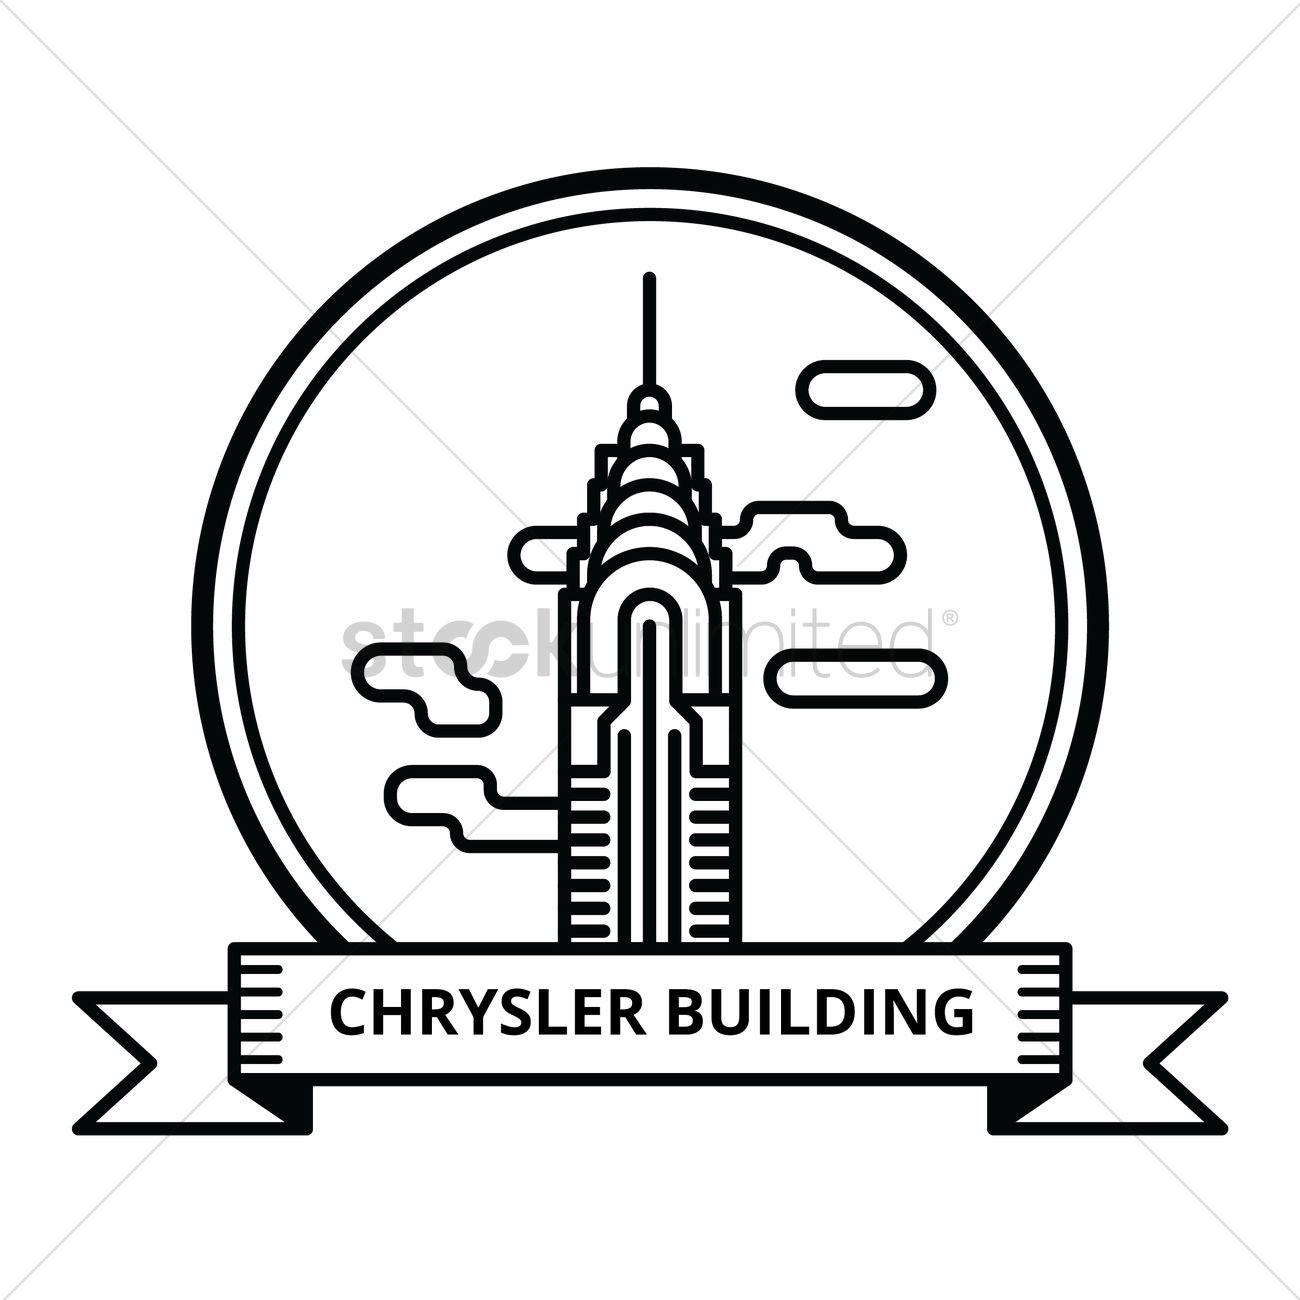 1300x1300 Chrysler Building Vector Image